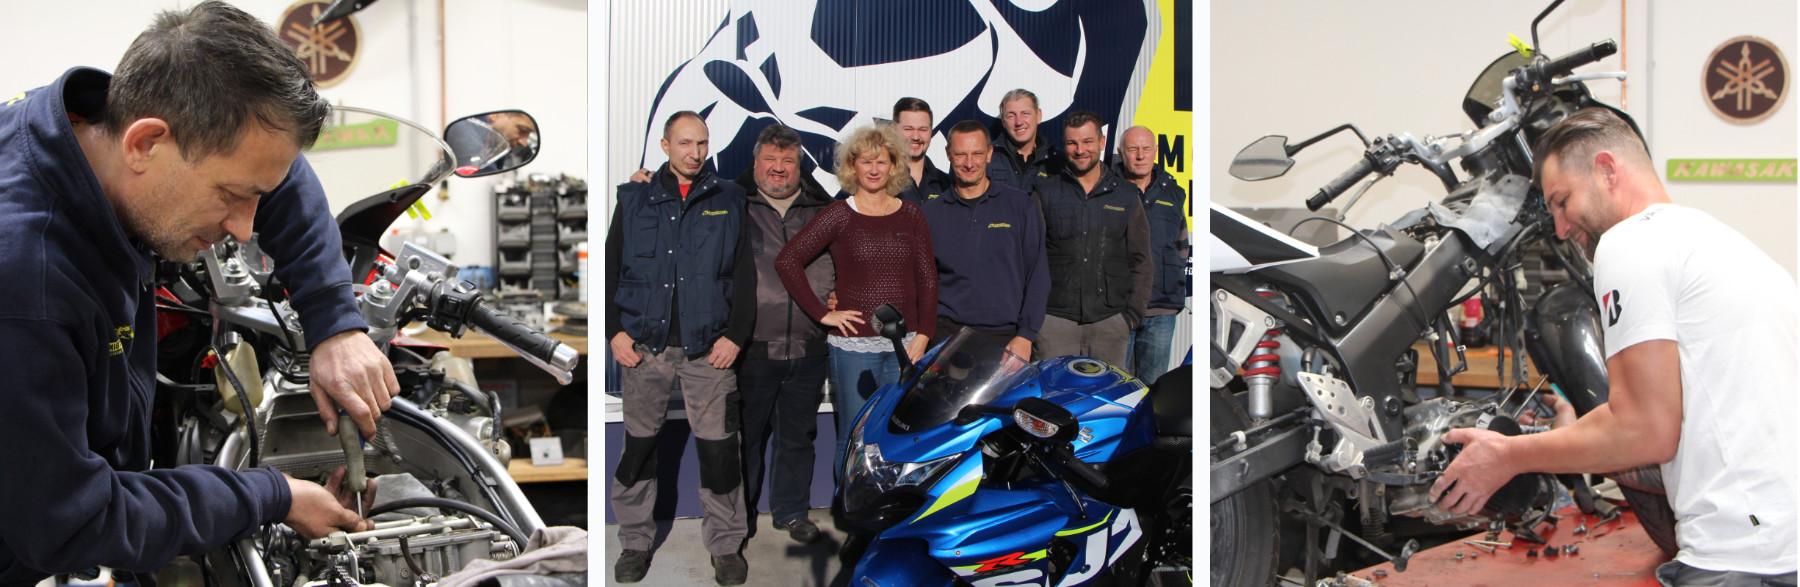 Motorradwerkstatt Wien - Gebrauchtbikes